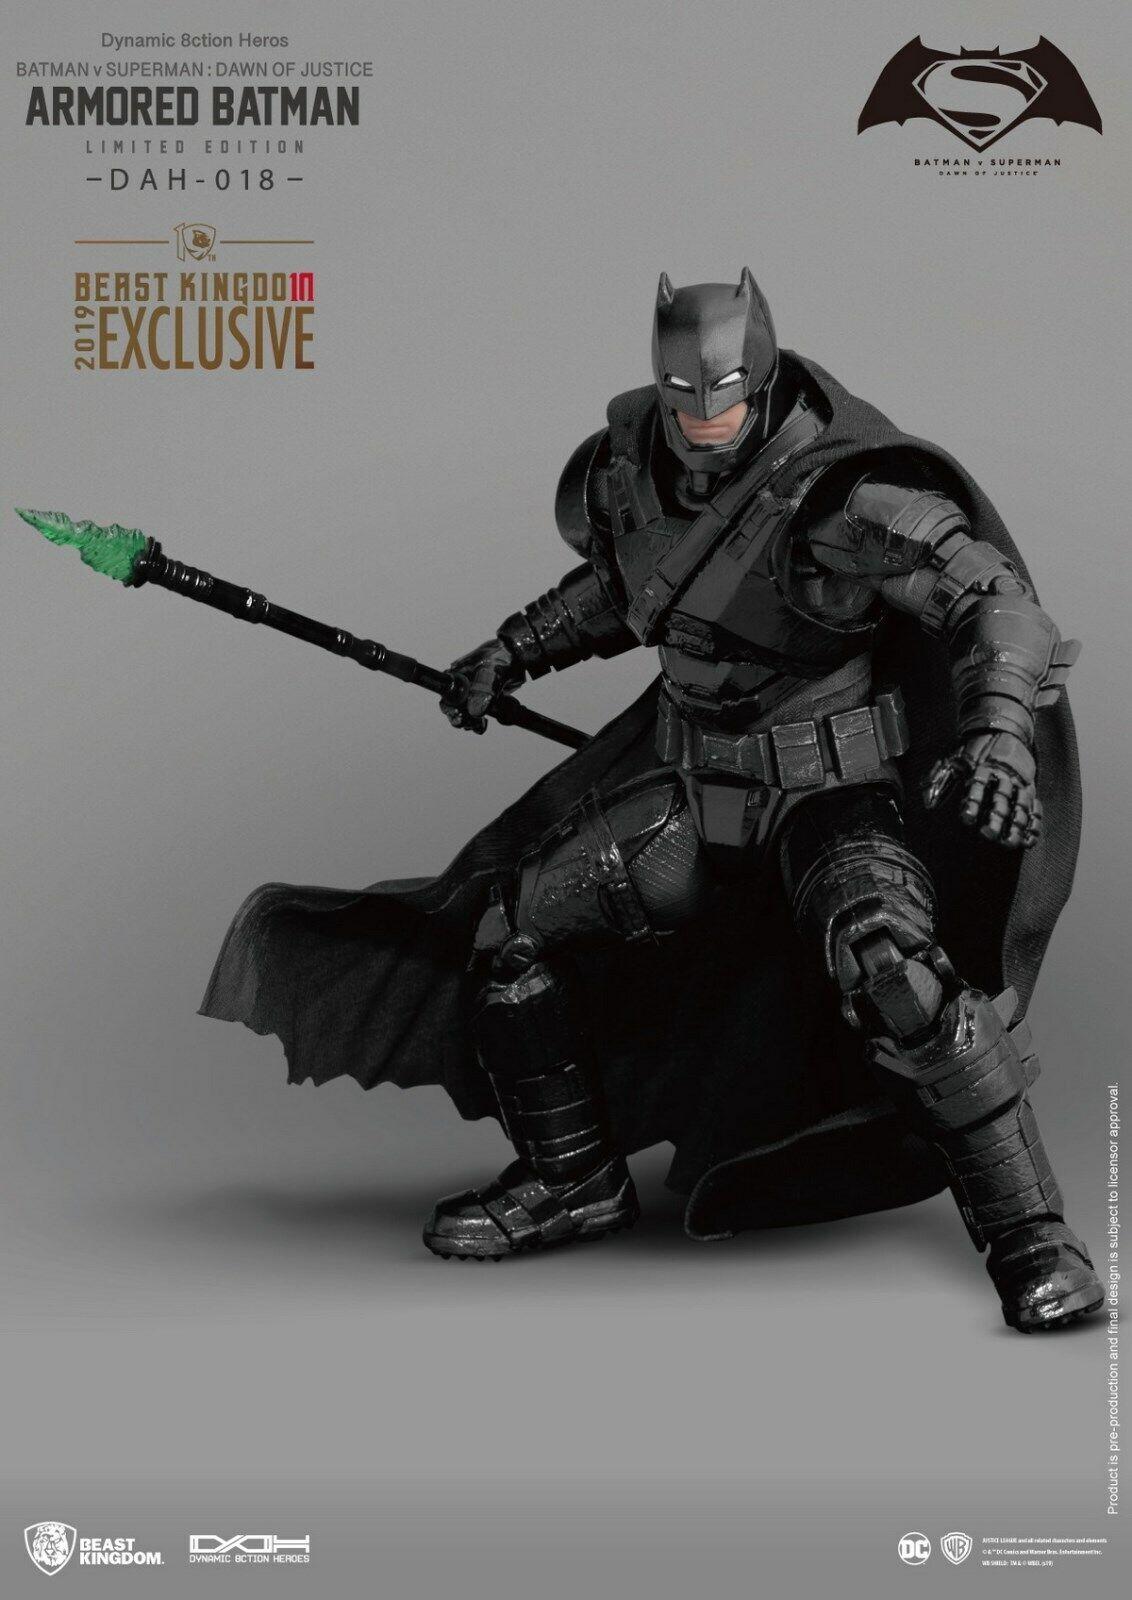 Bestia Reino 1 9 Batman Figura de acción héroes 20cm DAH-0180 Edición Limitada